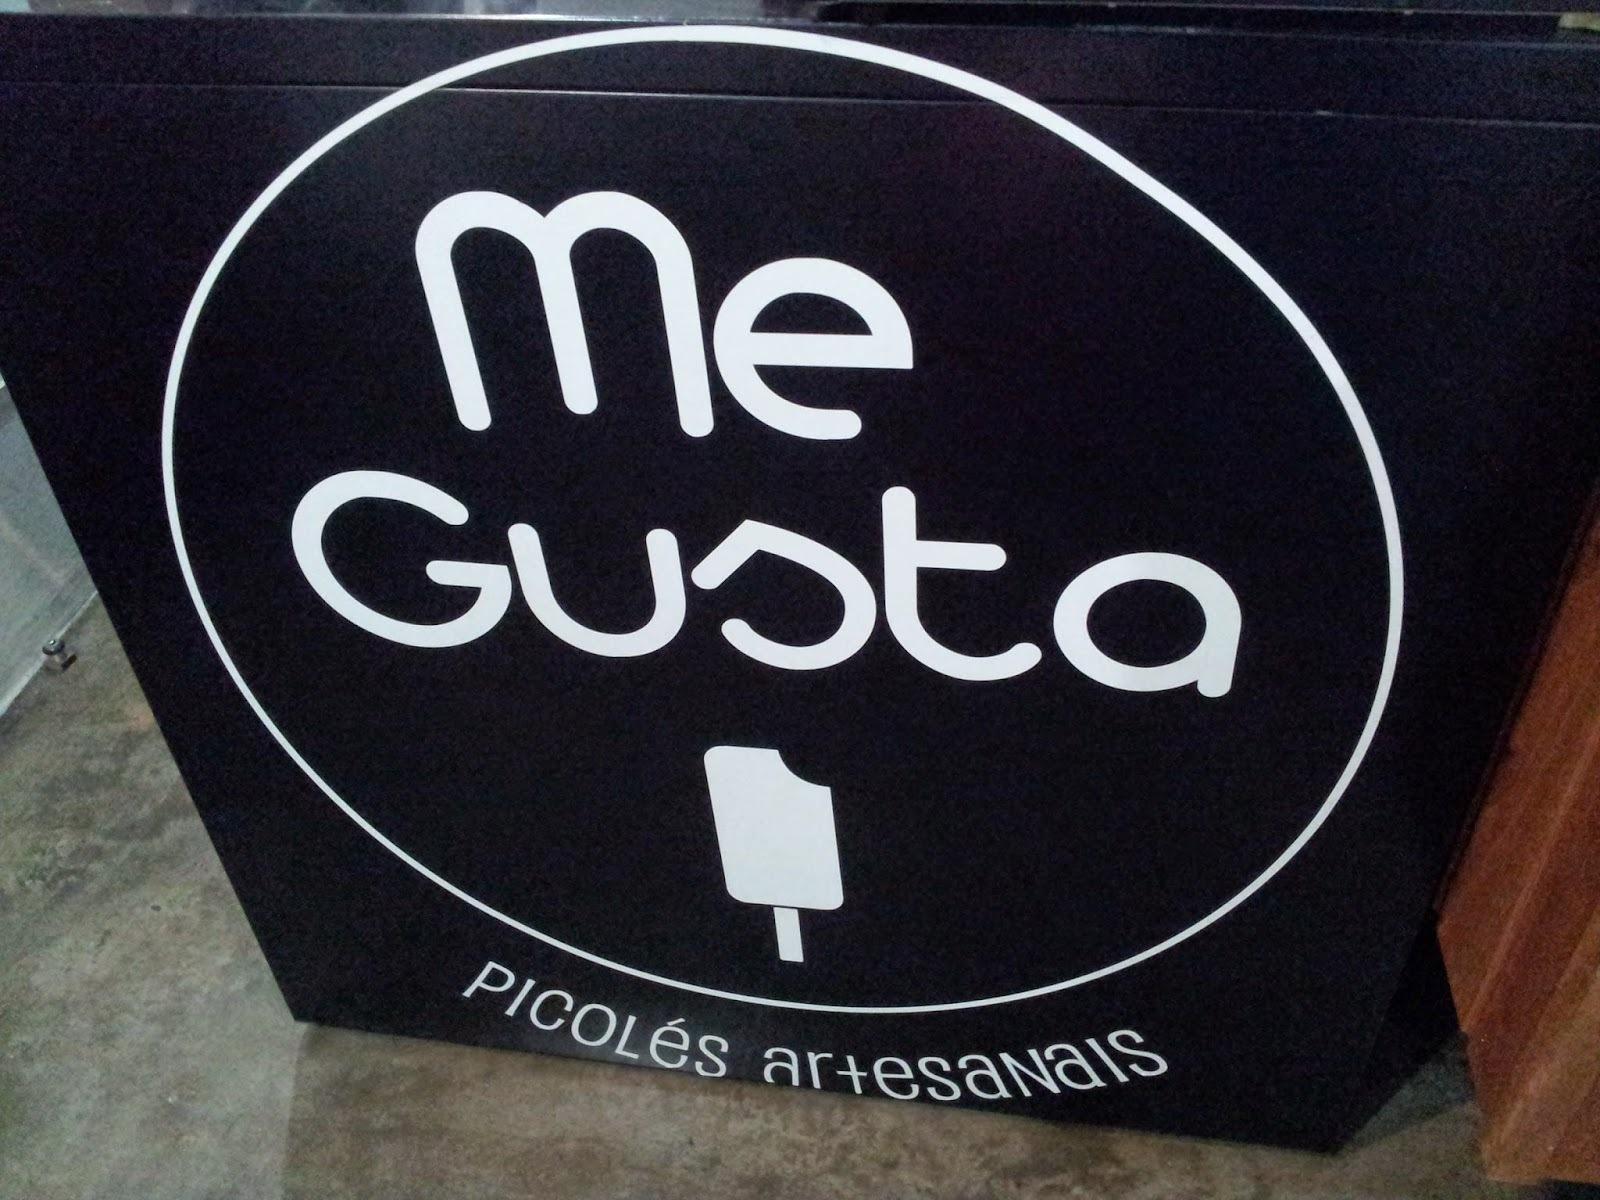 Me Gusta - Picolés Artesanais